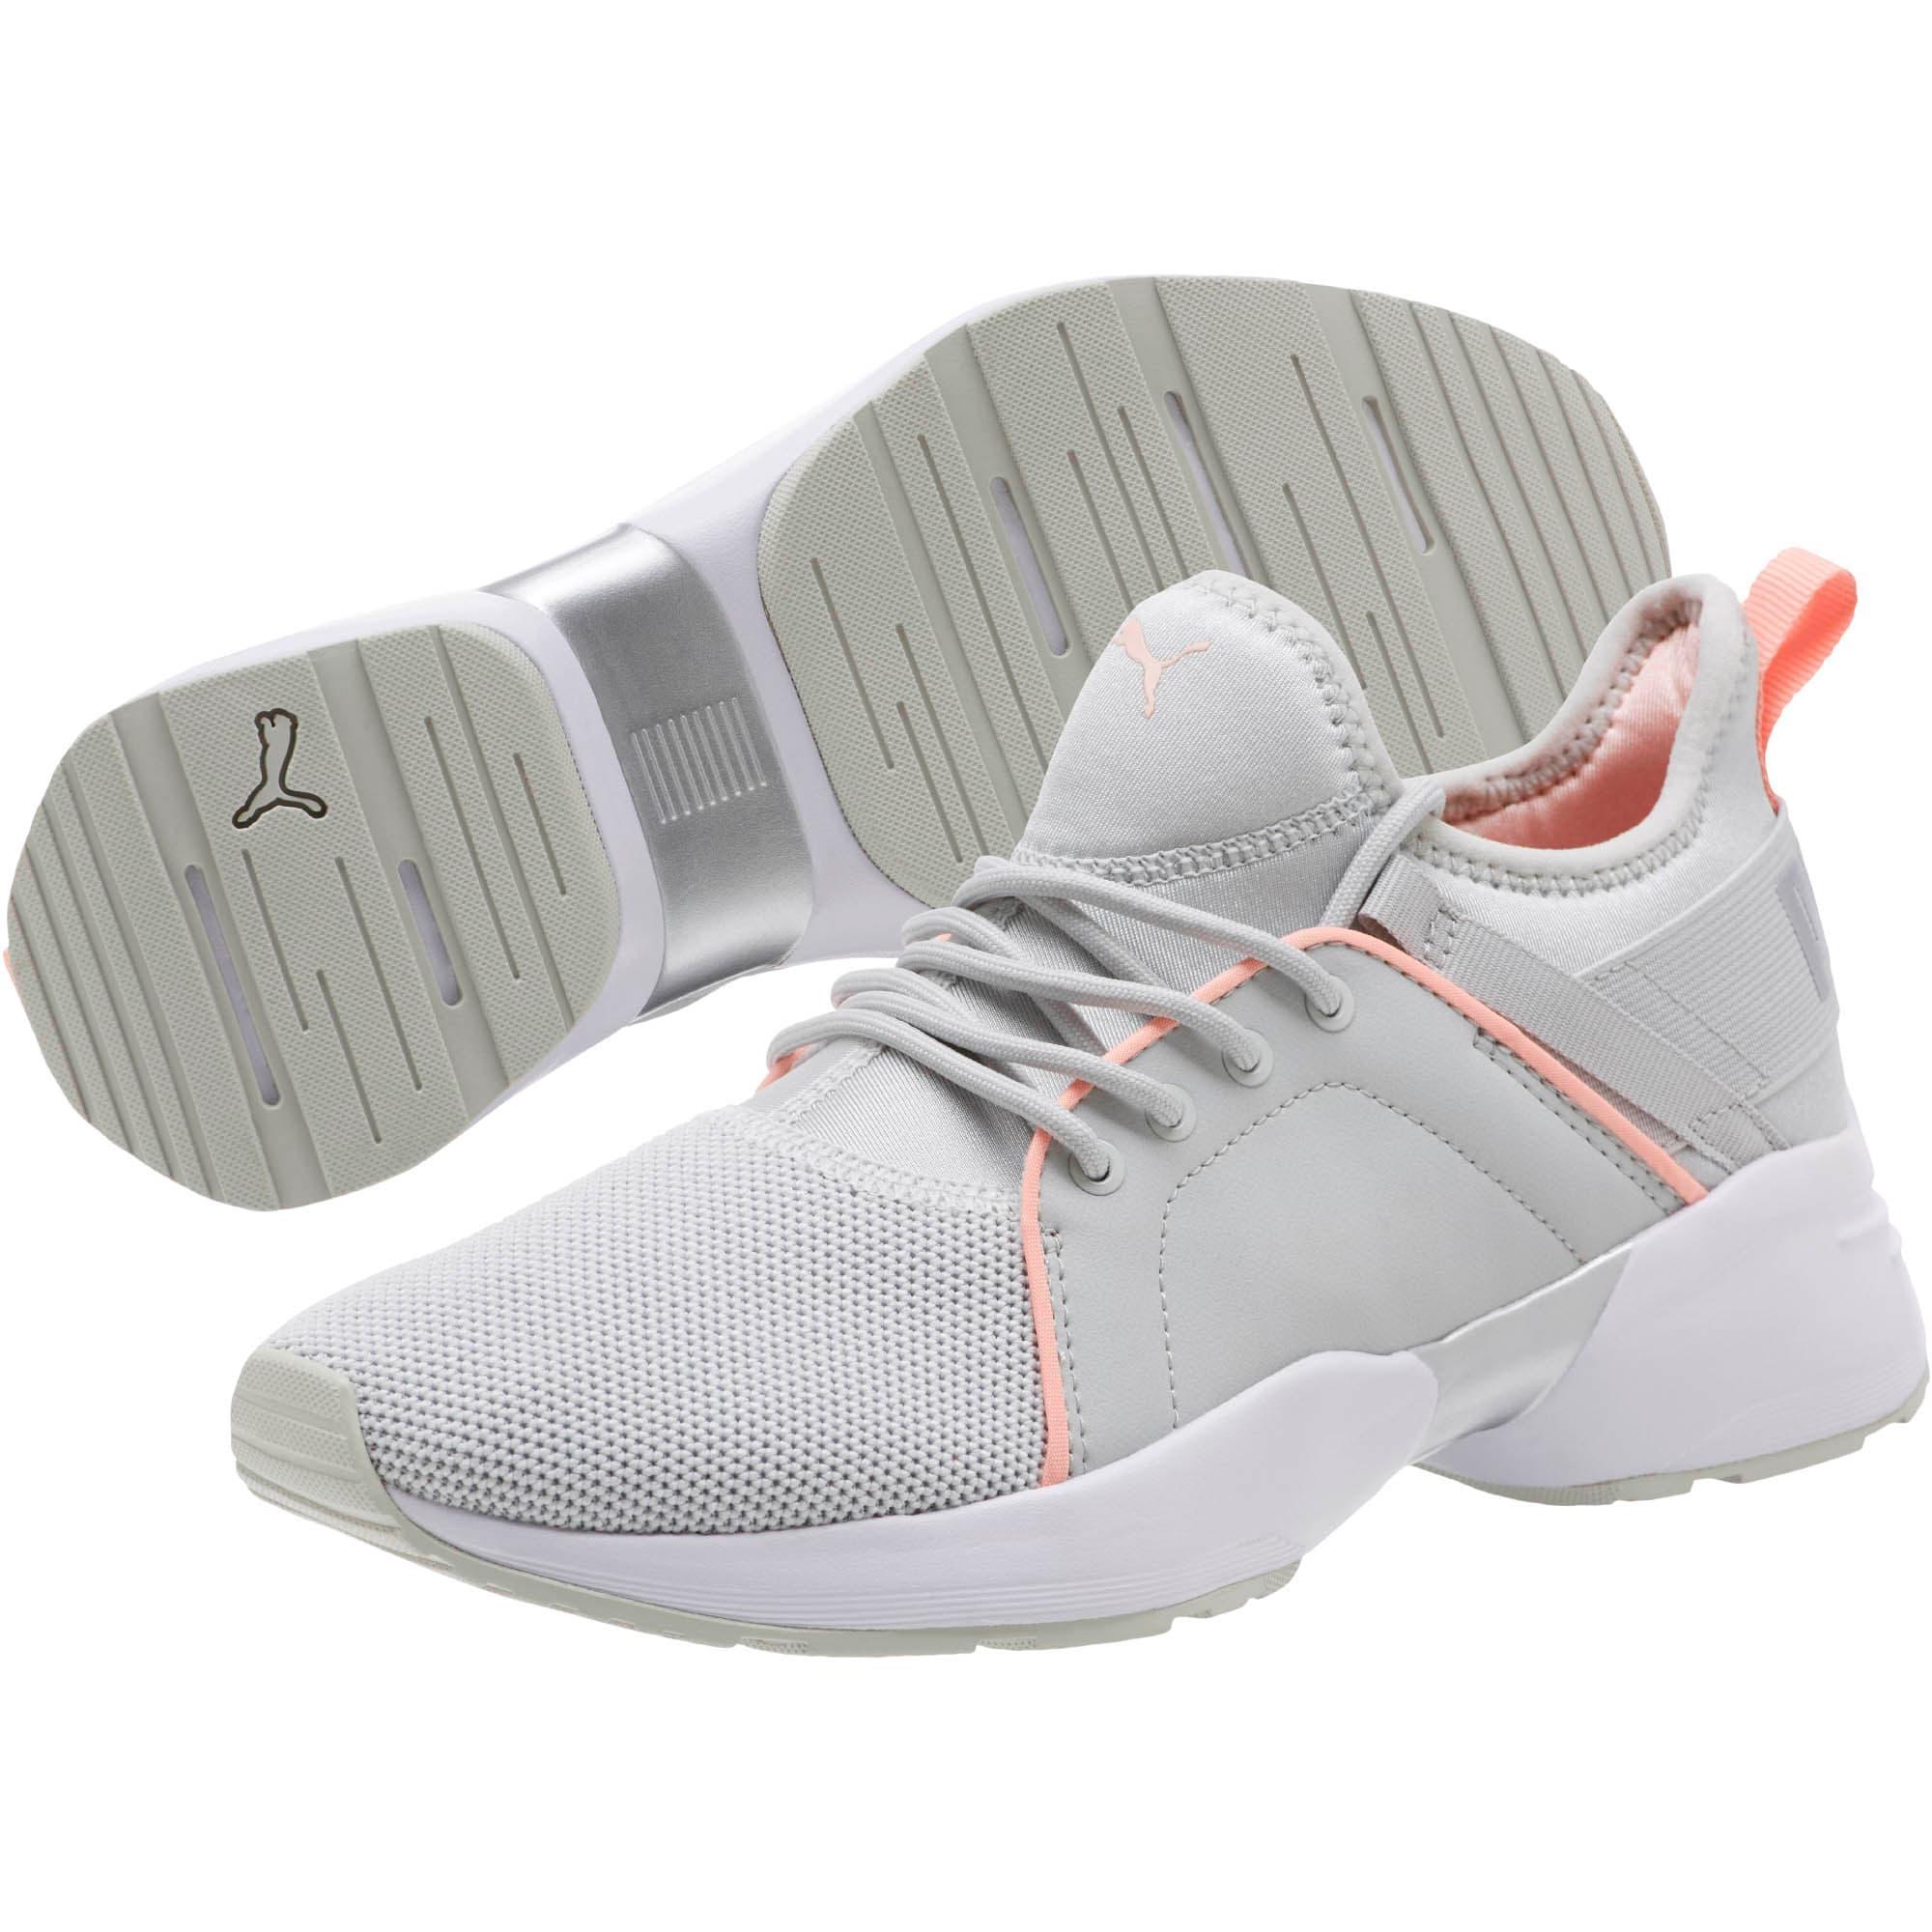 Thumbnail 2 of Sirena Women's Training Shoes, Glacier Gray-Peach Bud, medium